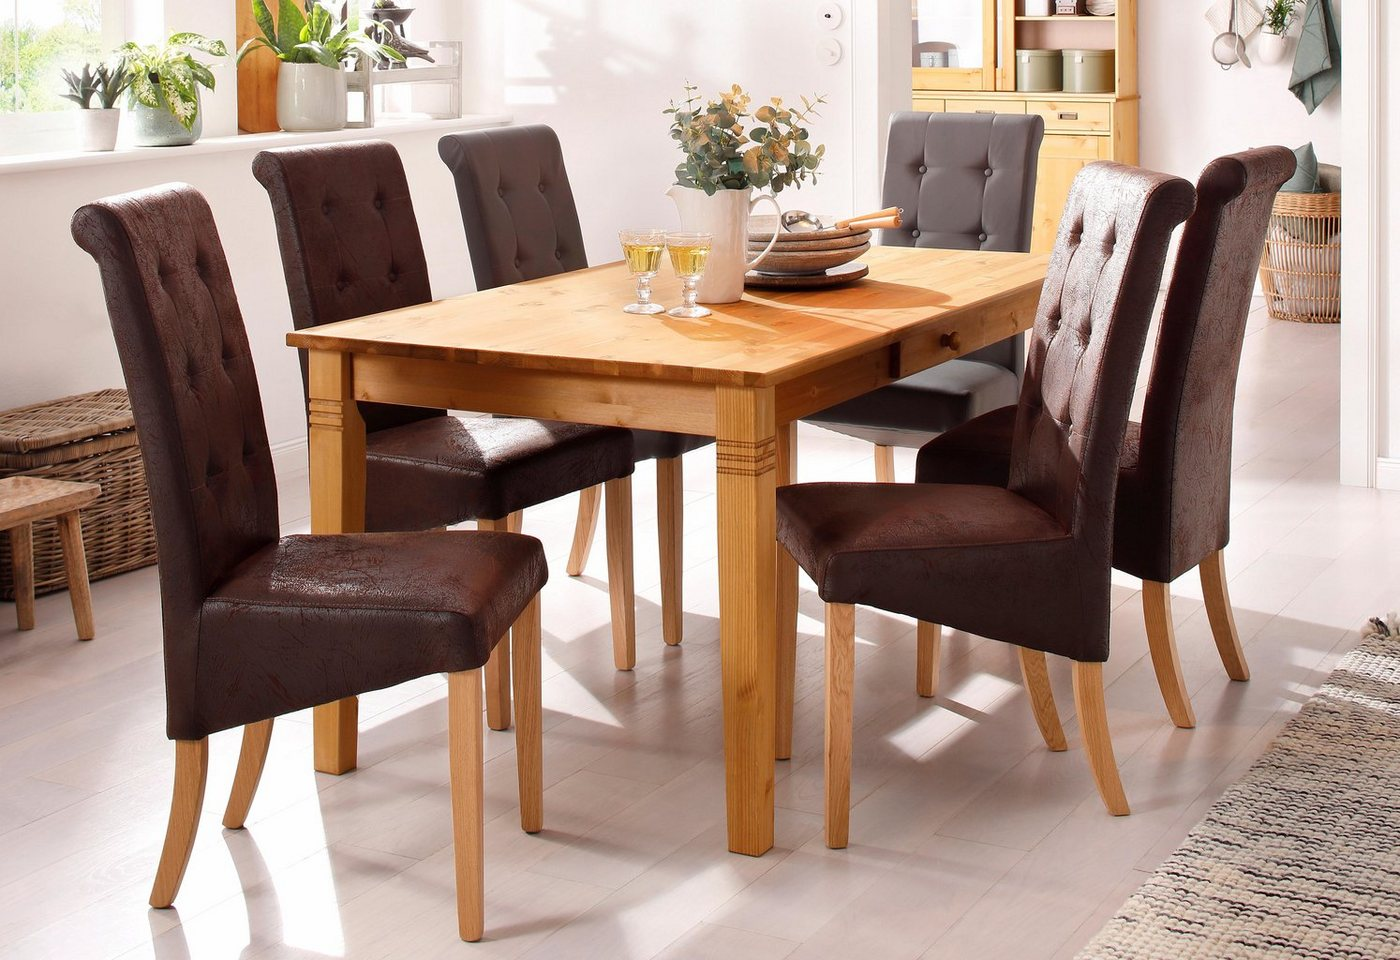 Houten tafel zwart verven: houten tafel verven. stunning hoogglans